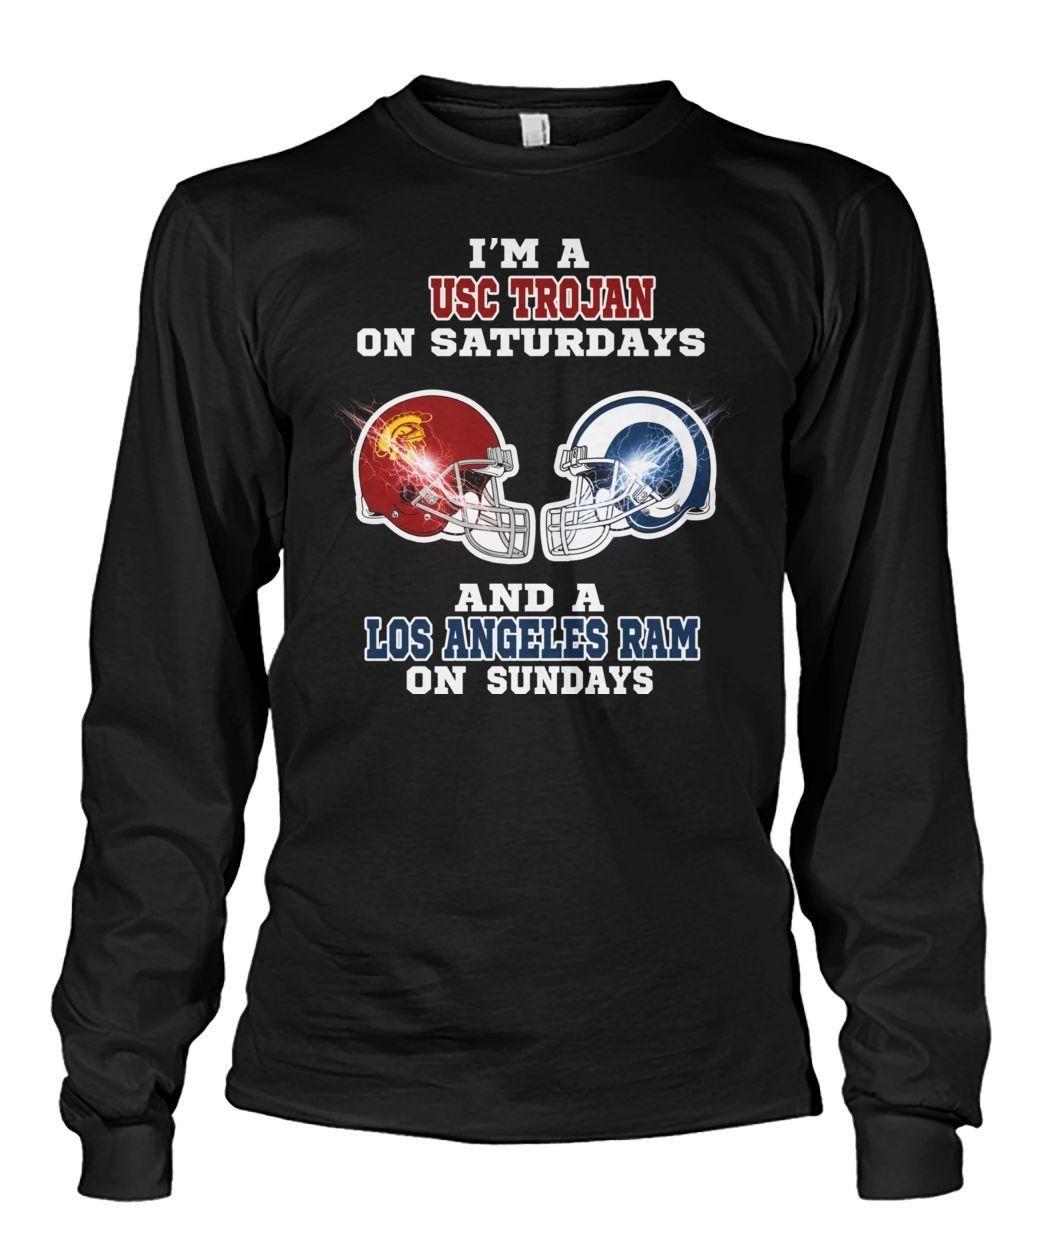 I'm A Usc Trojan On Saturdays And A Los Angeles Ram On Sundays Shirt